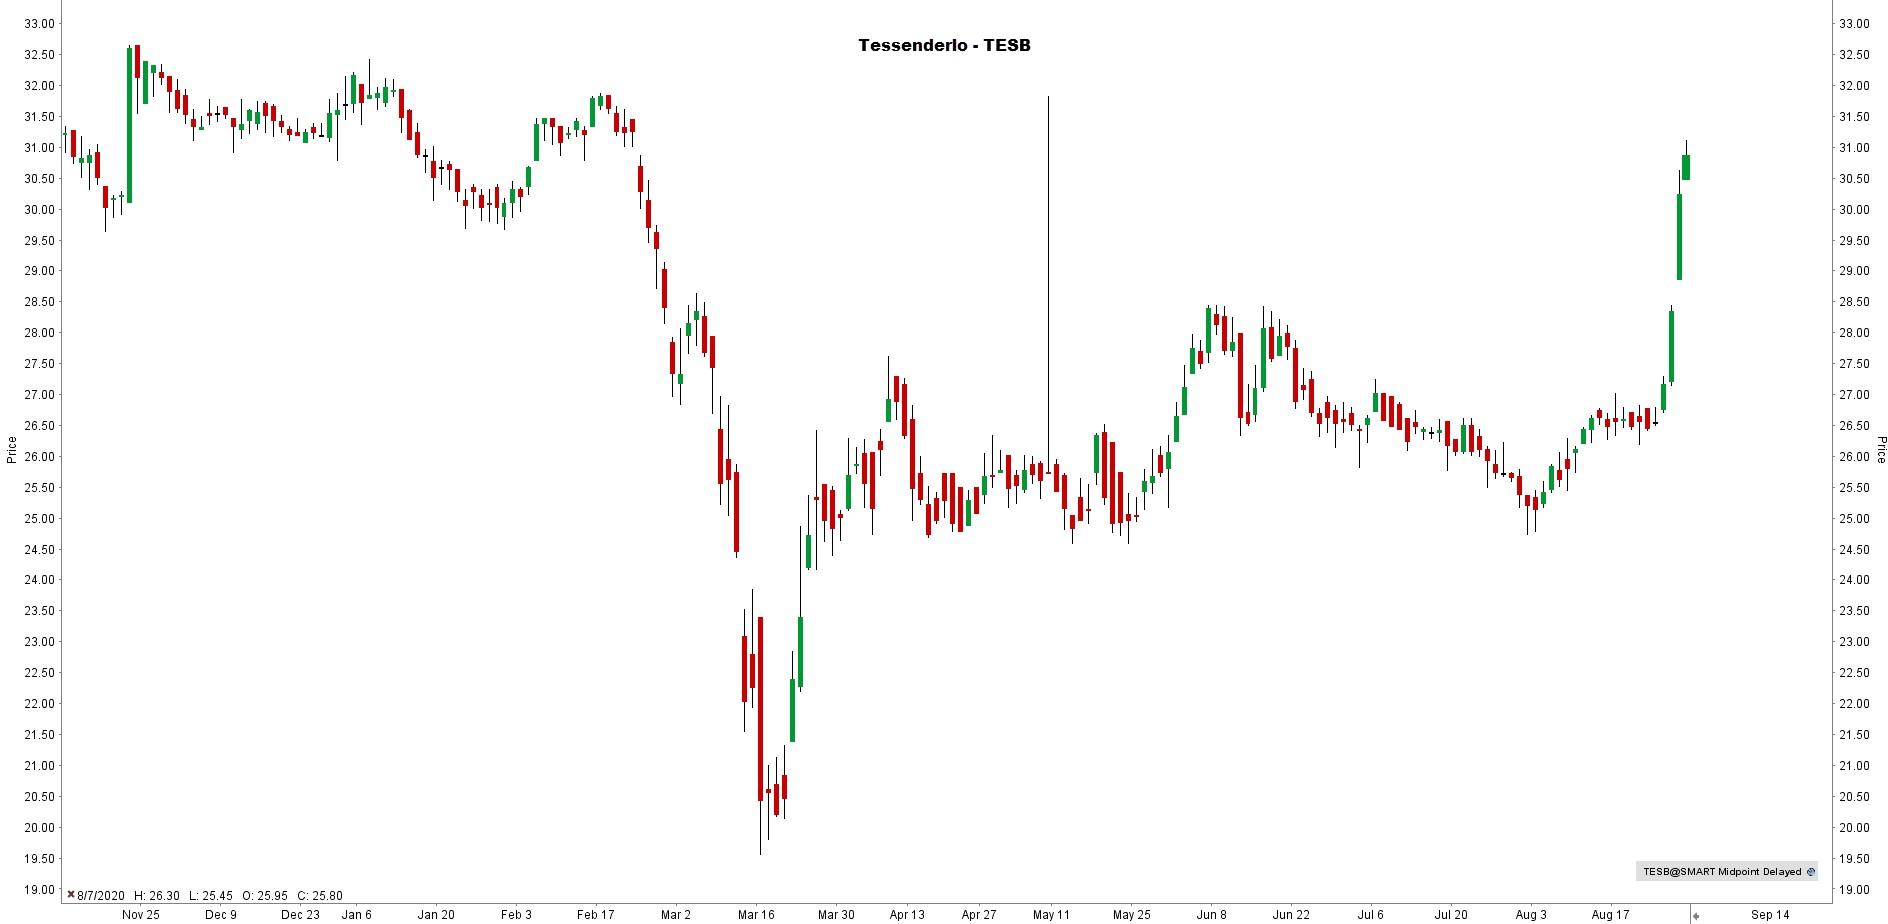 aandeel Tessenderlo koers - Grafiek aandeel Tessenderlo - aandelen Tessenderlo